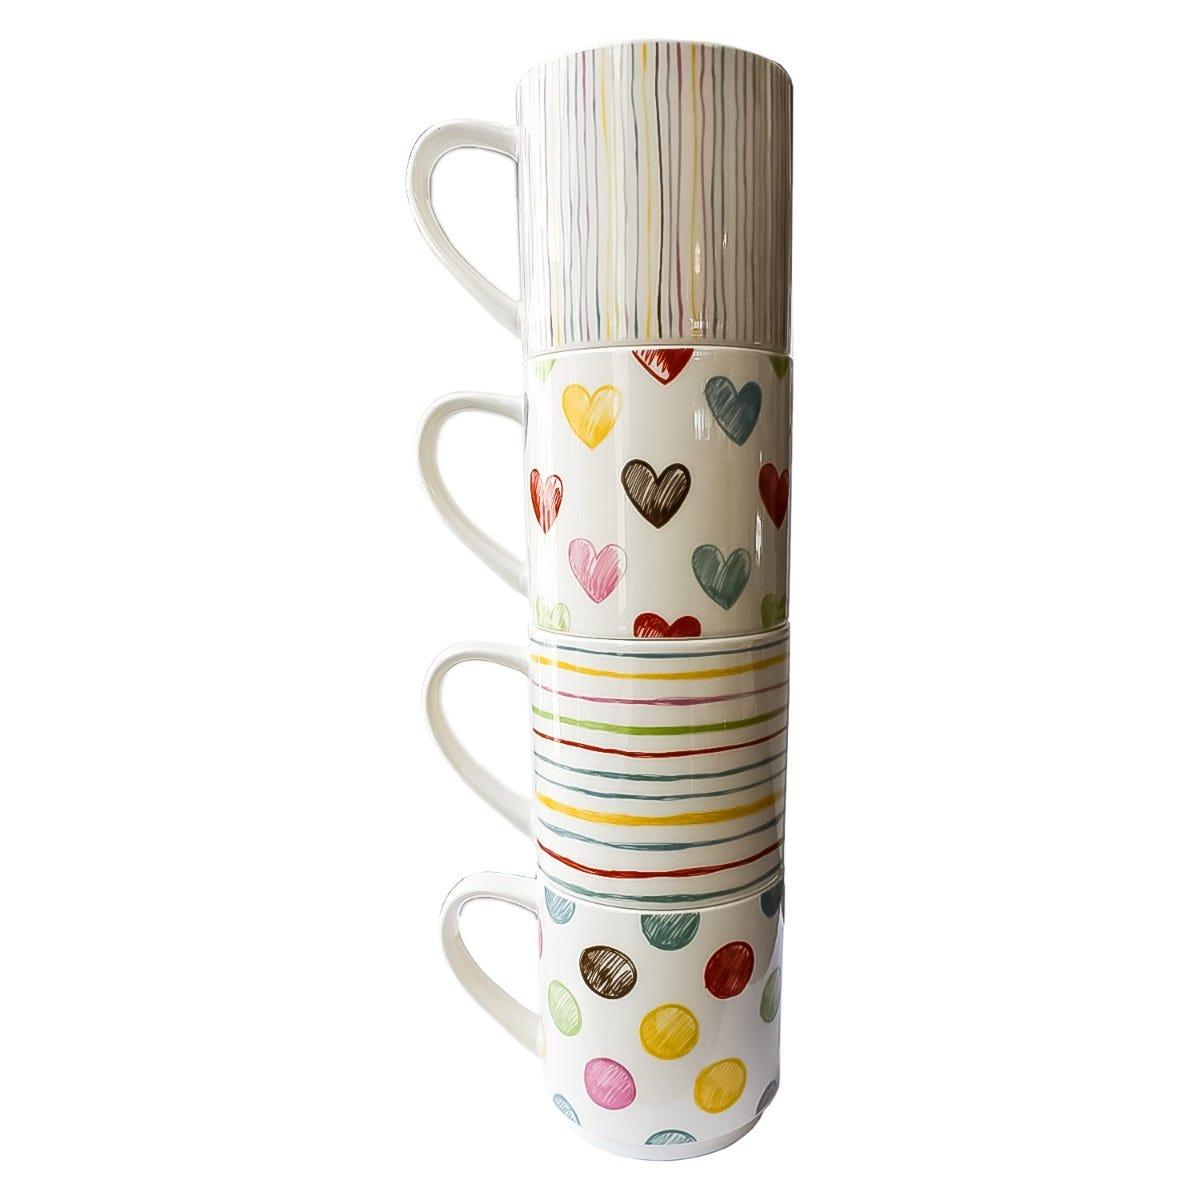 Tazas de porcelana Nuvó apliables en varios colores, Set de 4